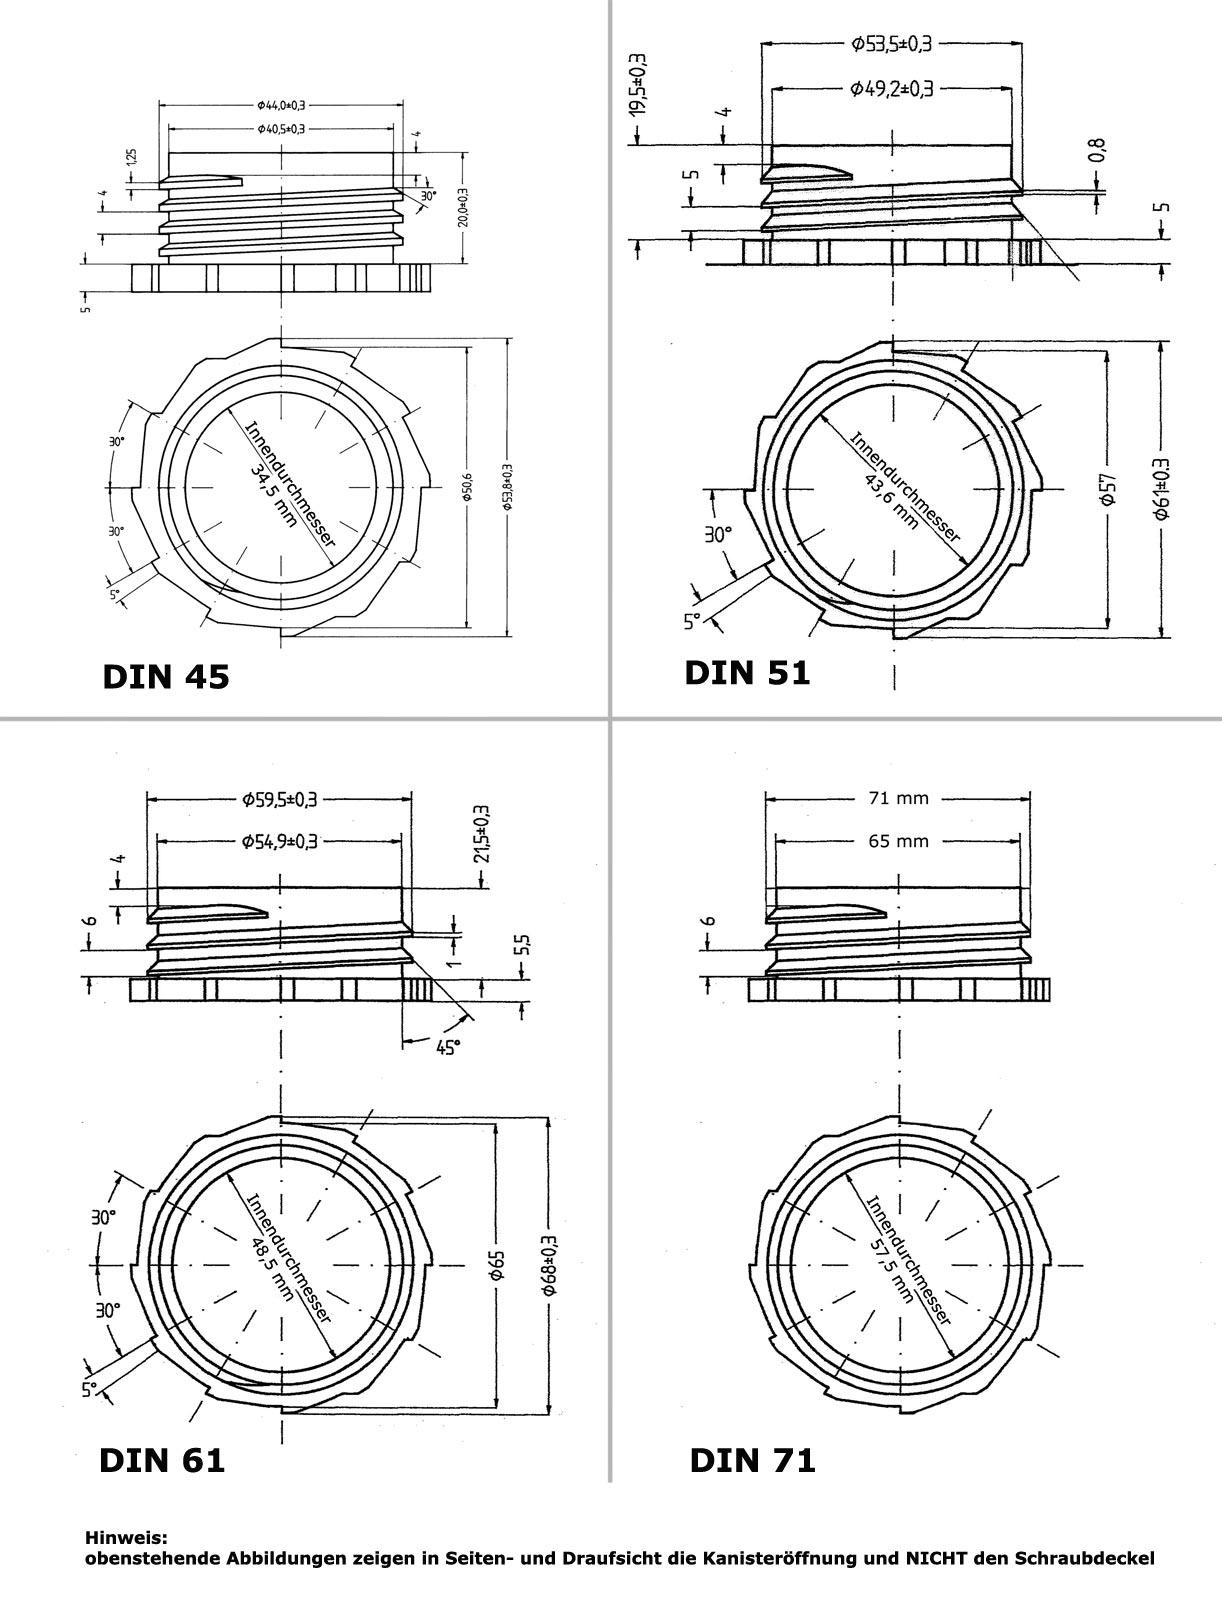 Long bec verseur flexible DIN 61 22037